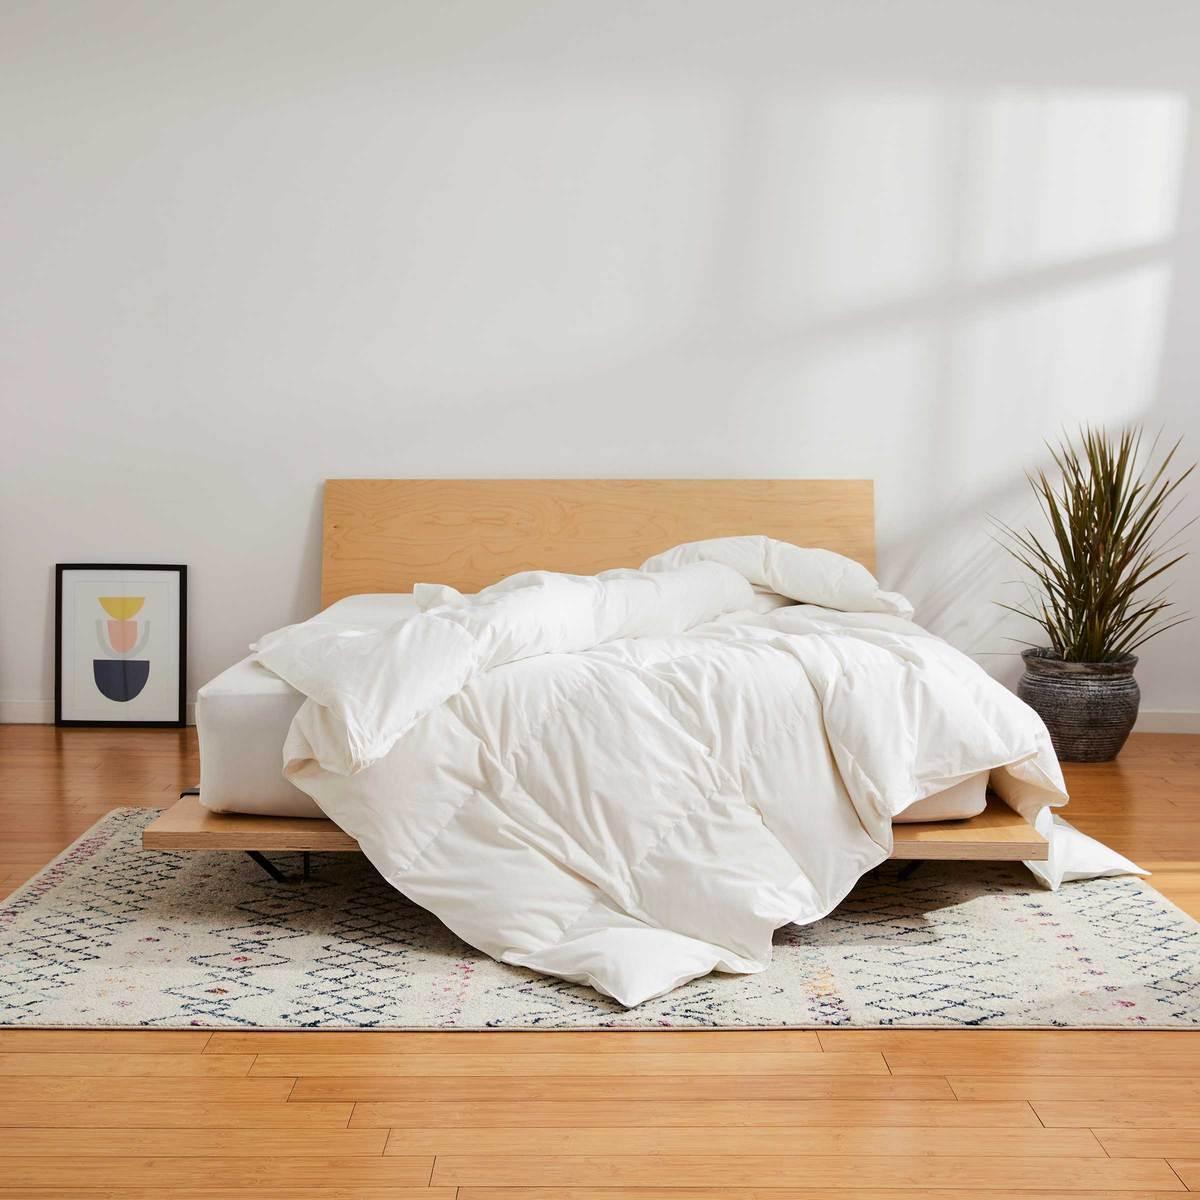 brooklinen down comforter, President day sale